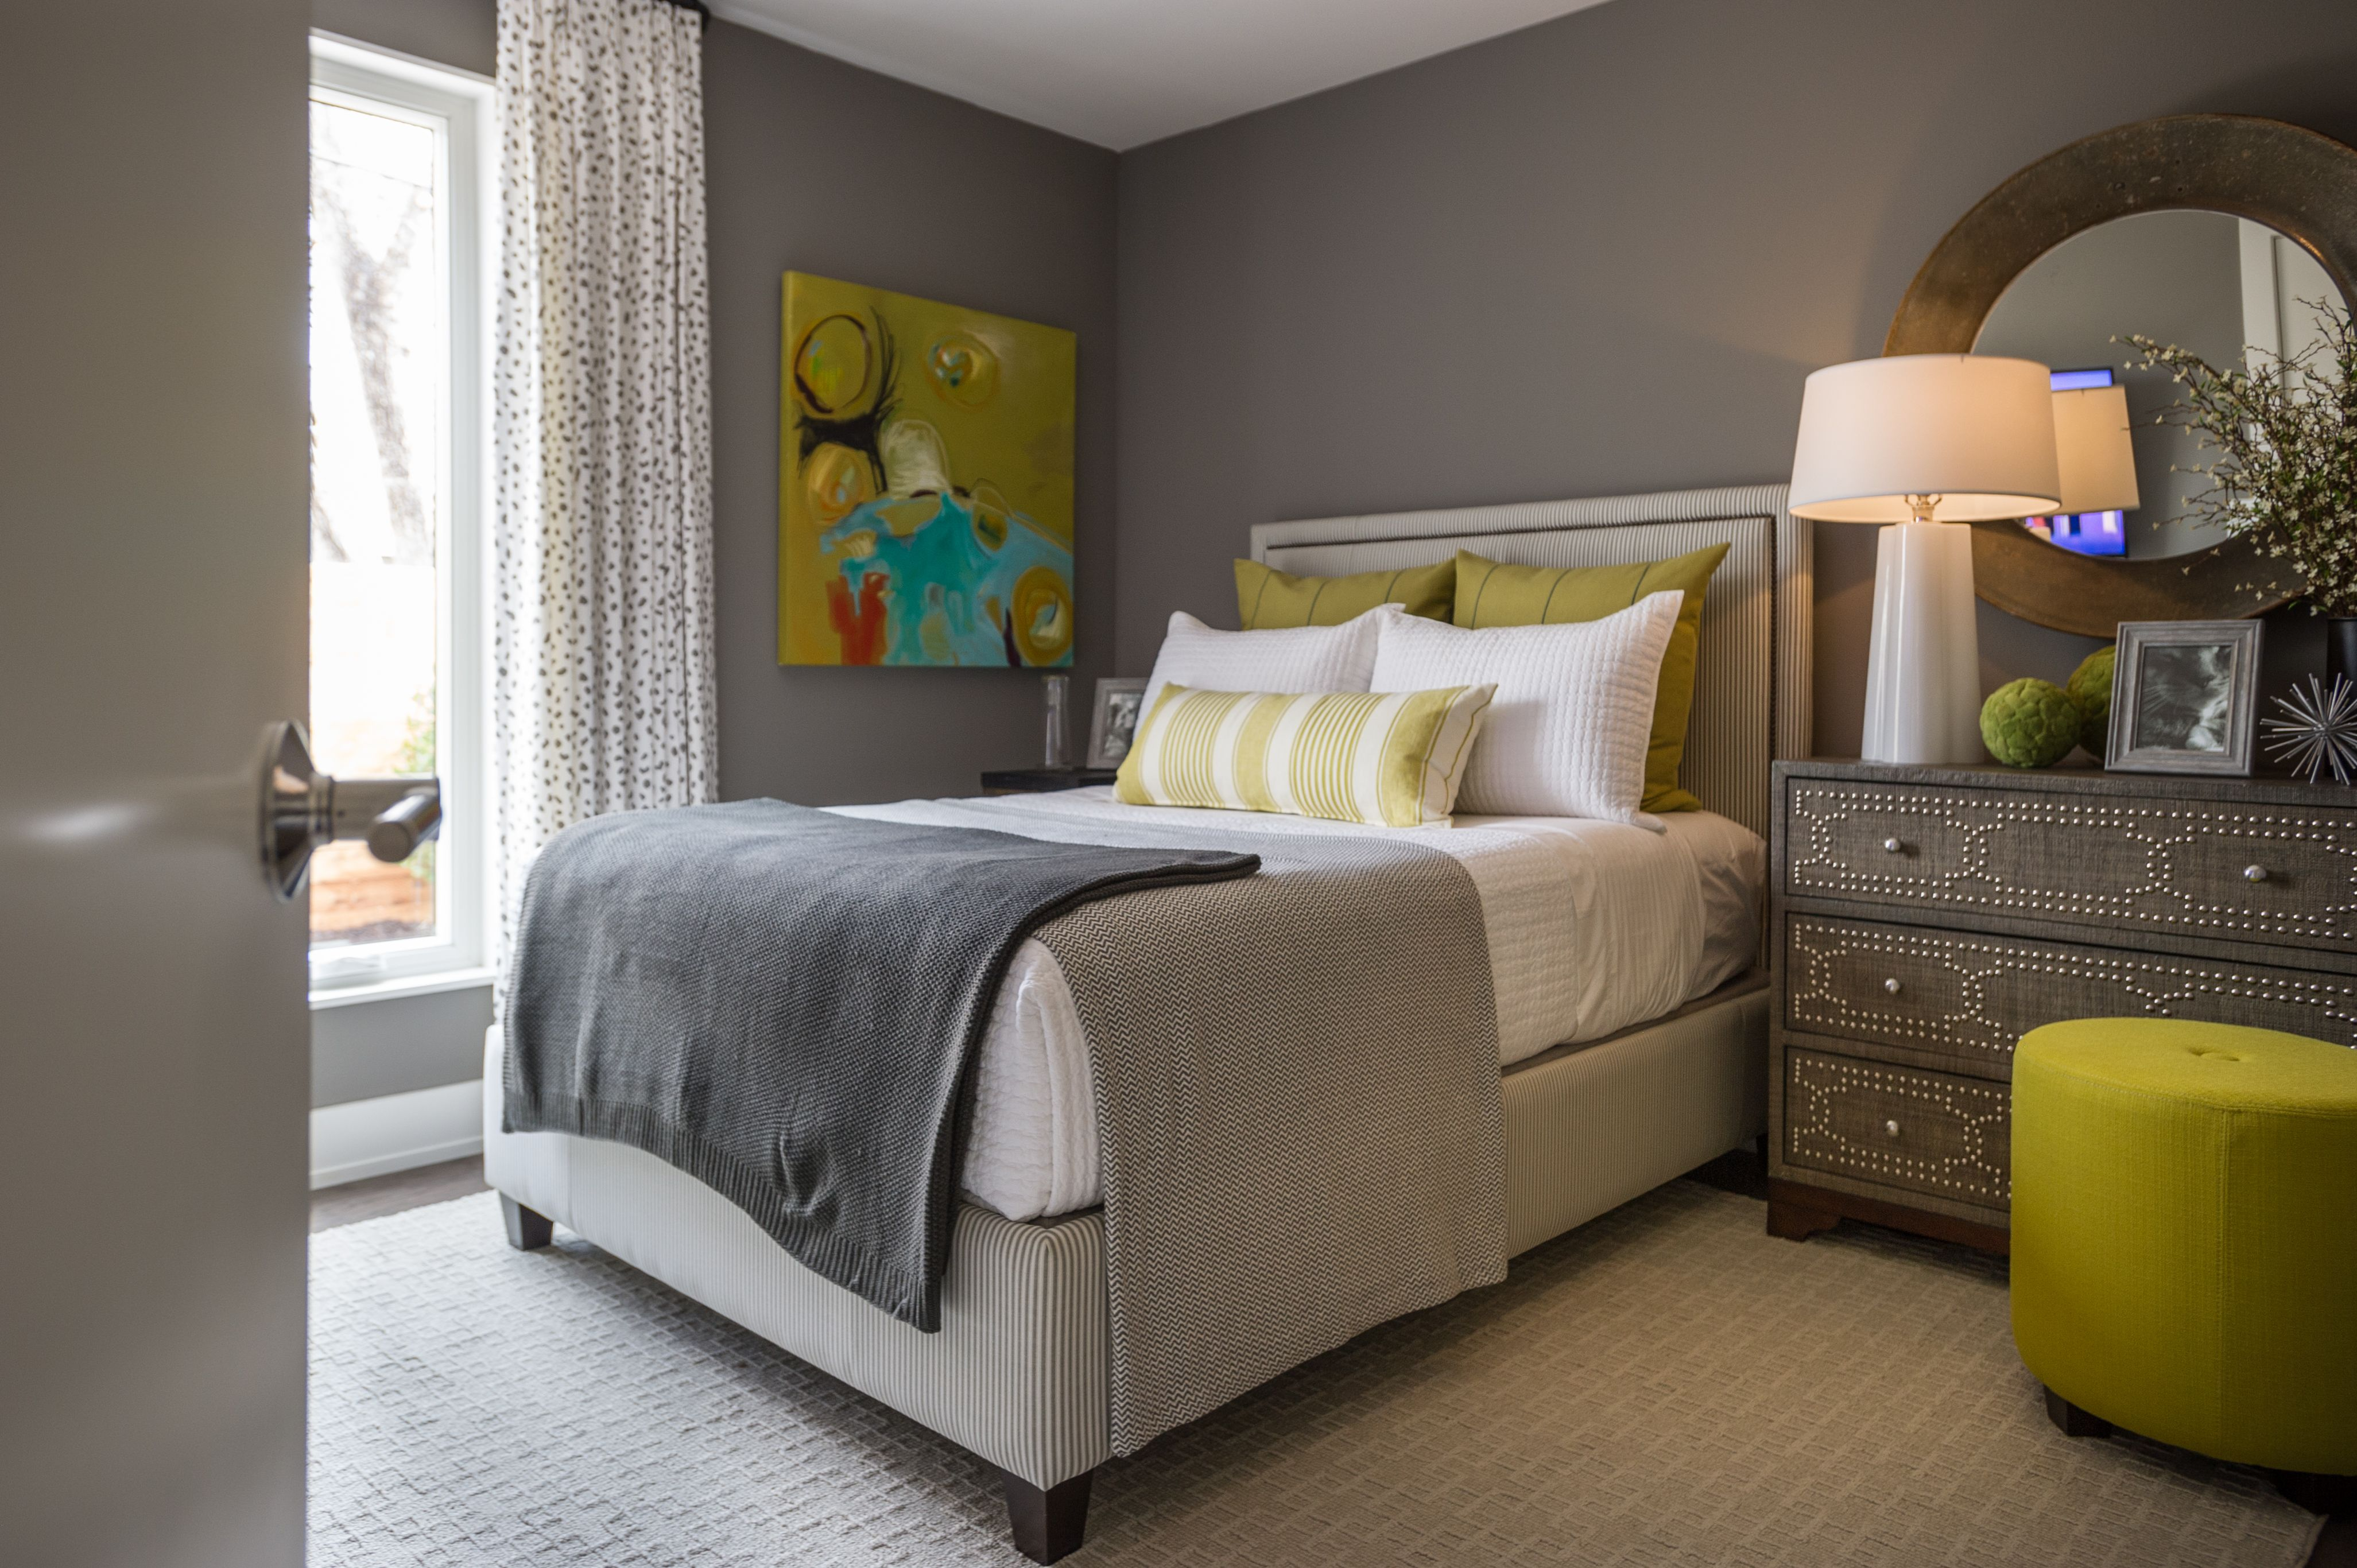 Enter The Hgtv Smart Home Giveaway 2015 Today Quicken Loans Guest Bedroom Guest Bedrooms Modern Bedroom Design Hgtv modern bedroom ideas